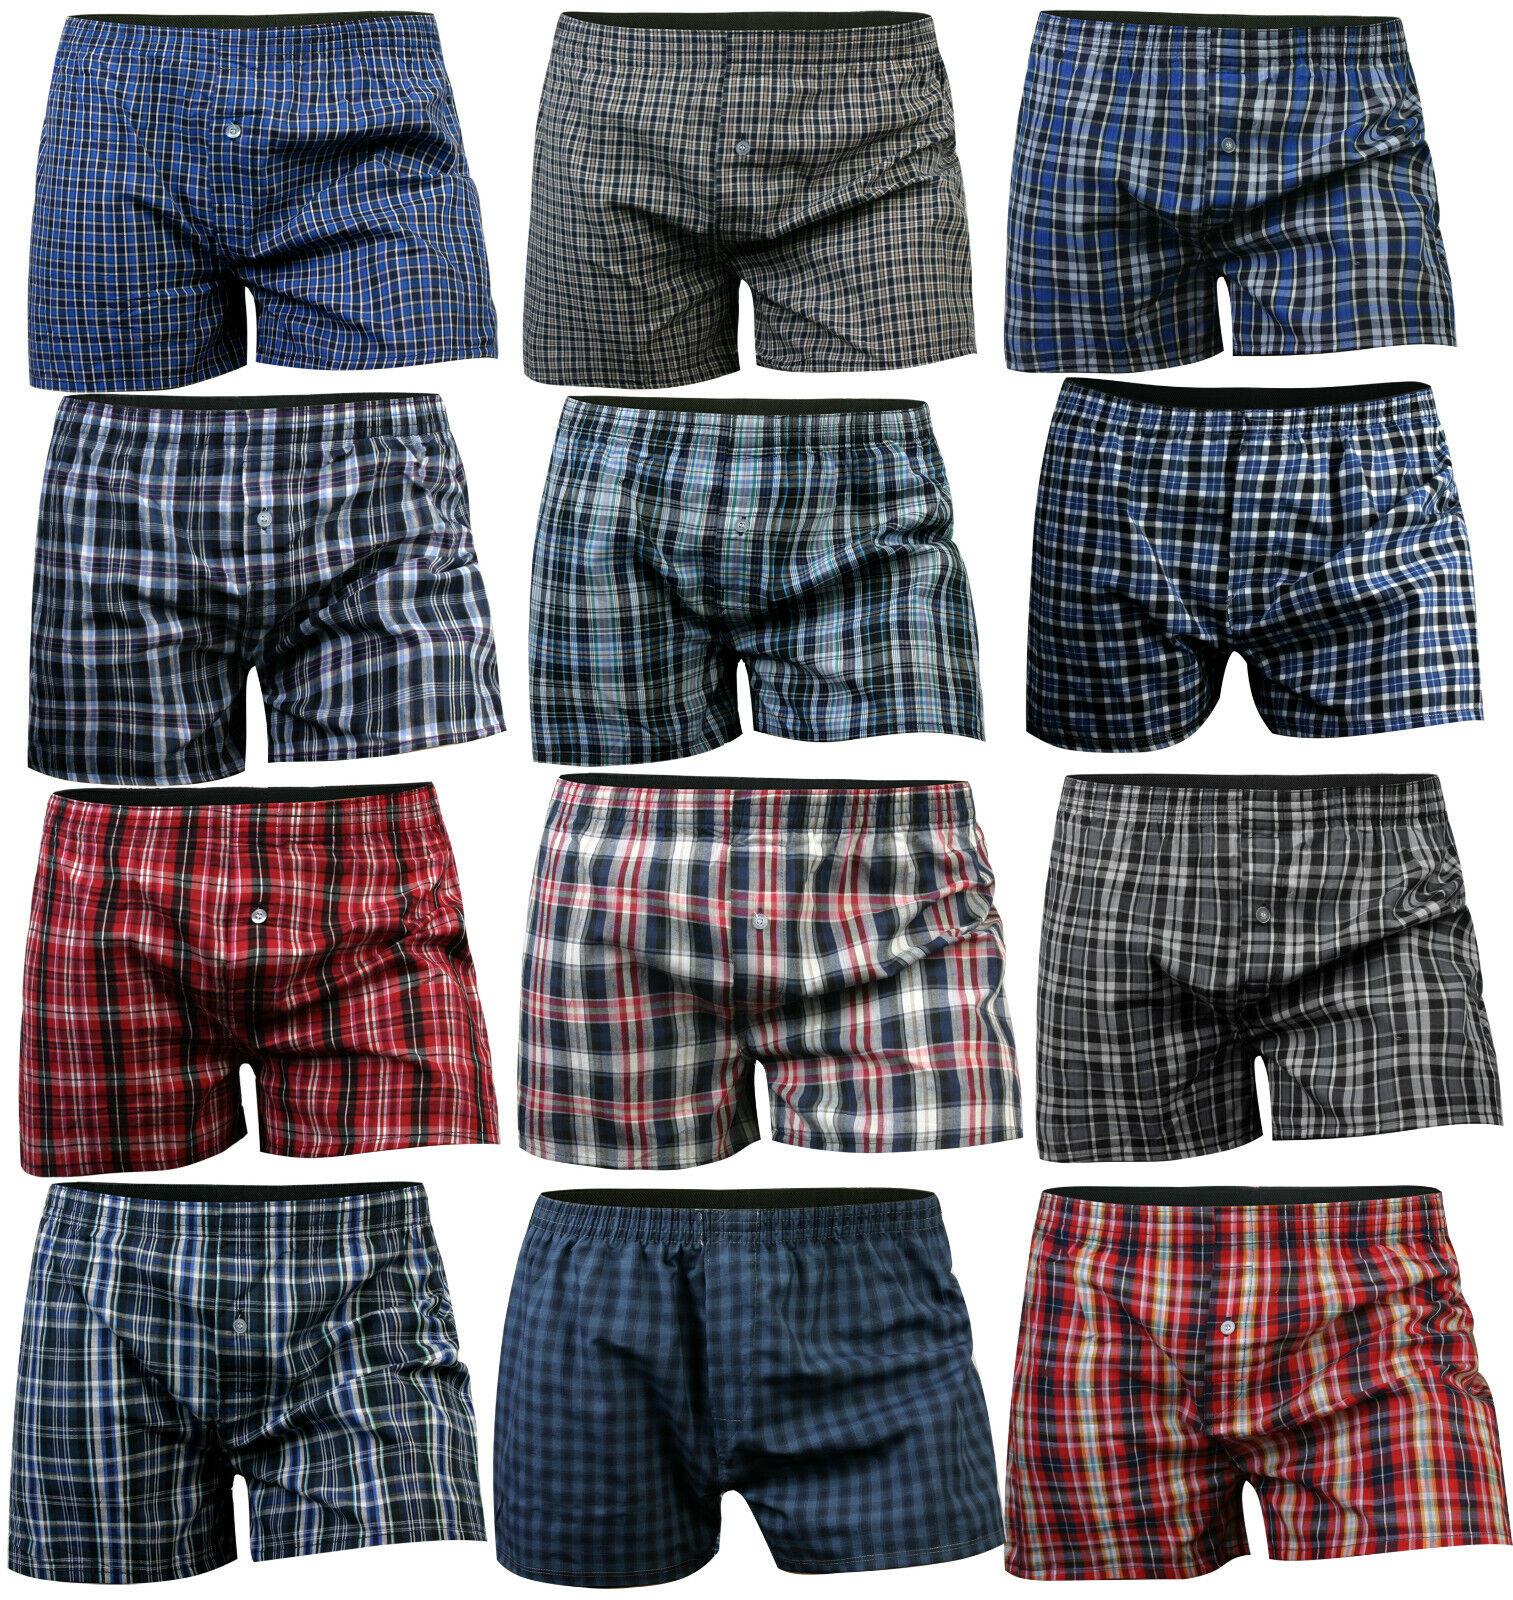 4 - 20 Paket Webboxer Boxershorts Baumwolle Boxer Shorts Unterhose S M L XL XXL